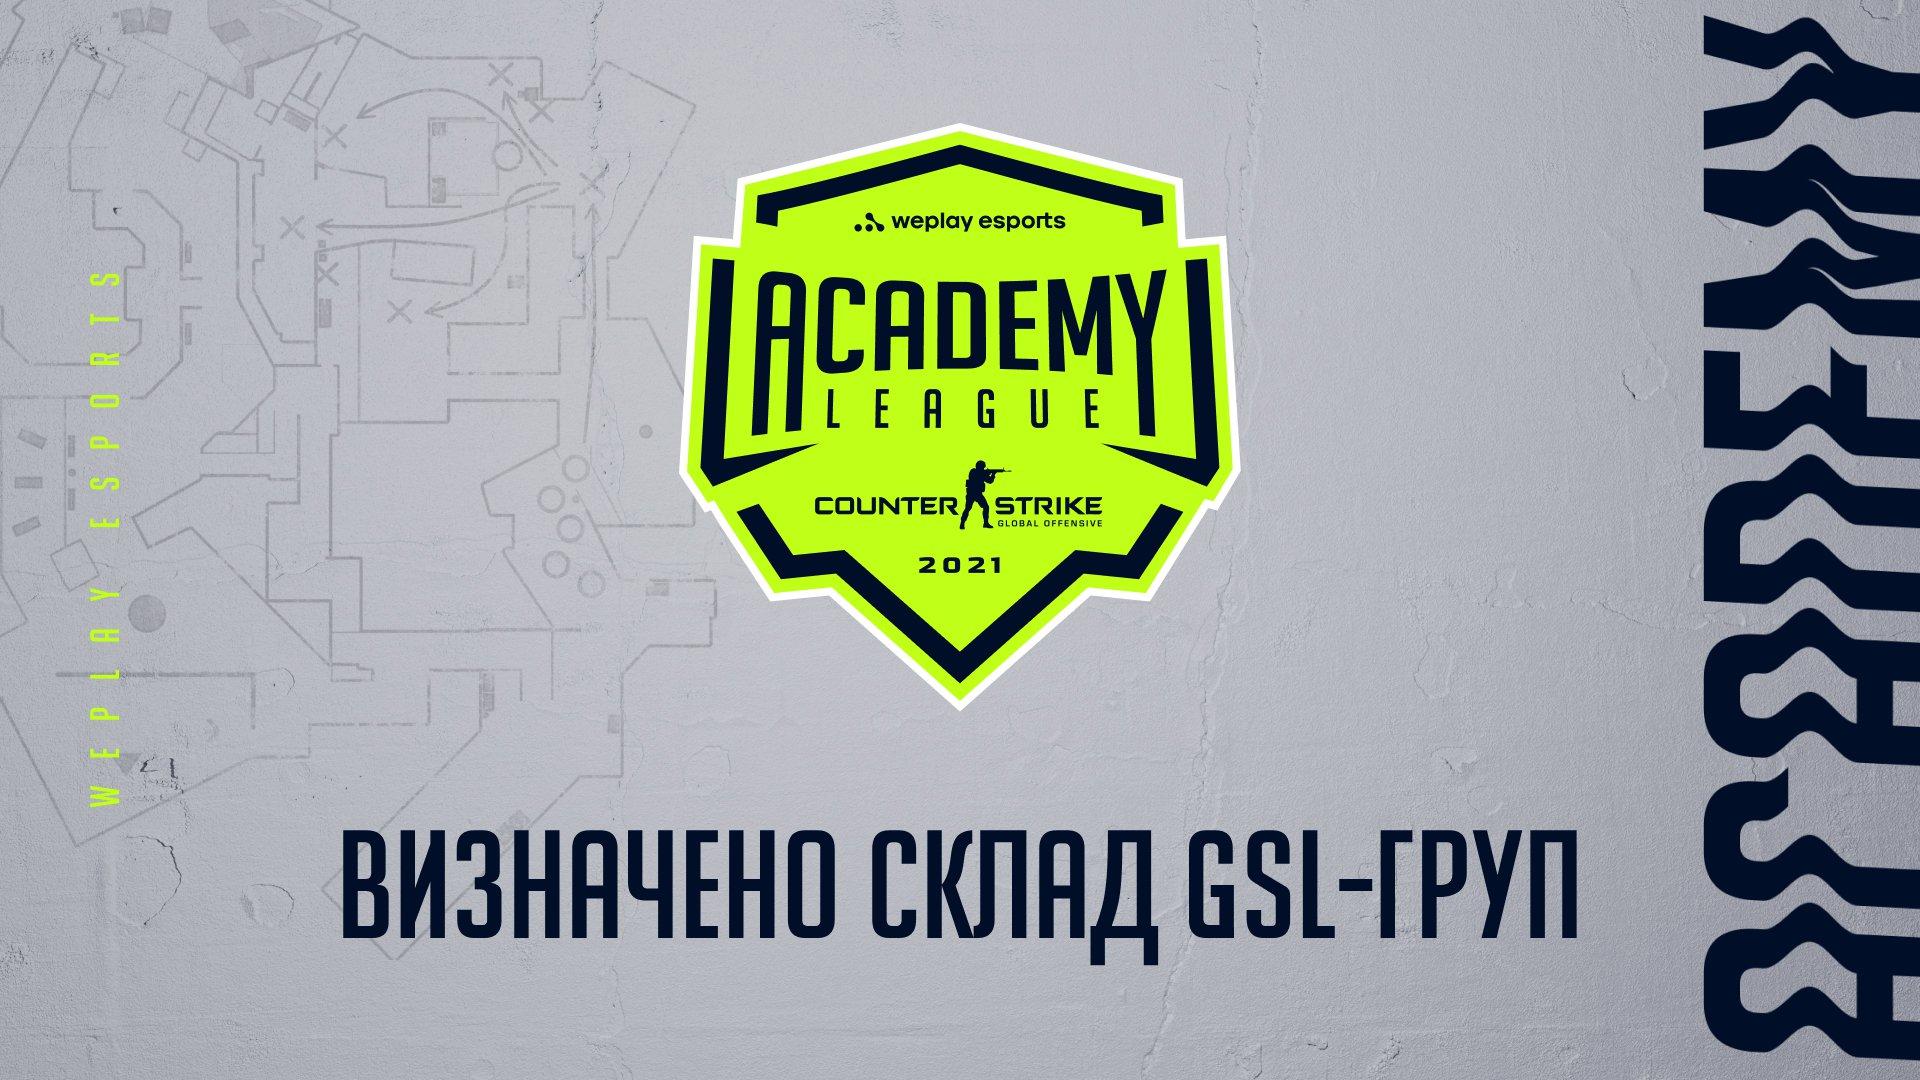 Визначено склад GSL-груп другого сезону WePlay Academy League. Зображення: WePlay Holding